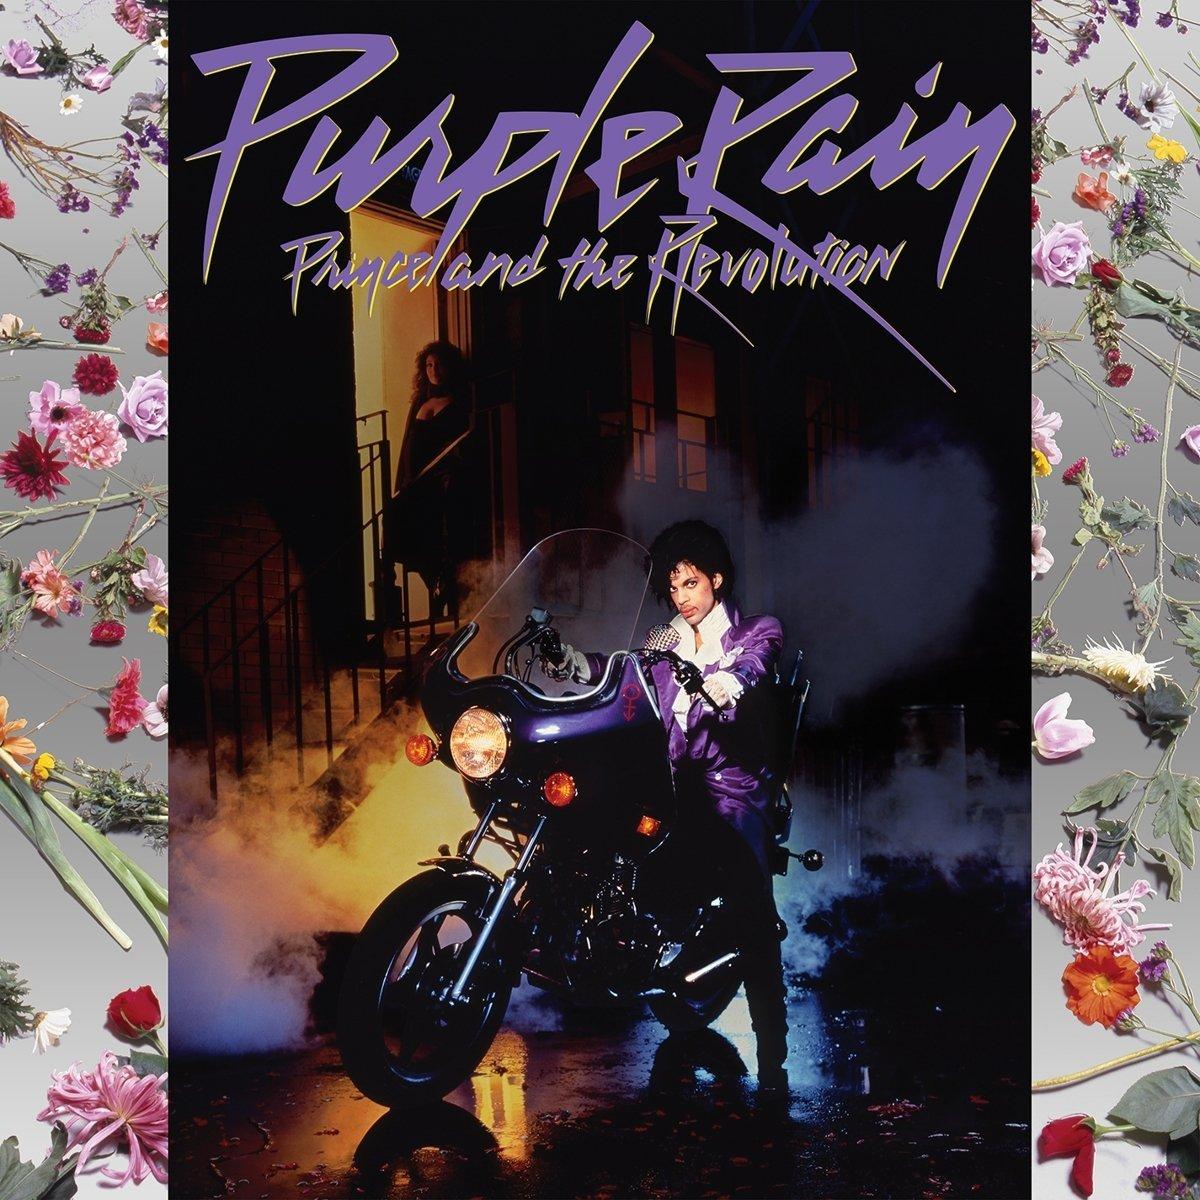 PURPLE RAIN(2015 PAISLEY PARK REMASTER) / PRINCE & THE REVOLUTIONのジャケット